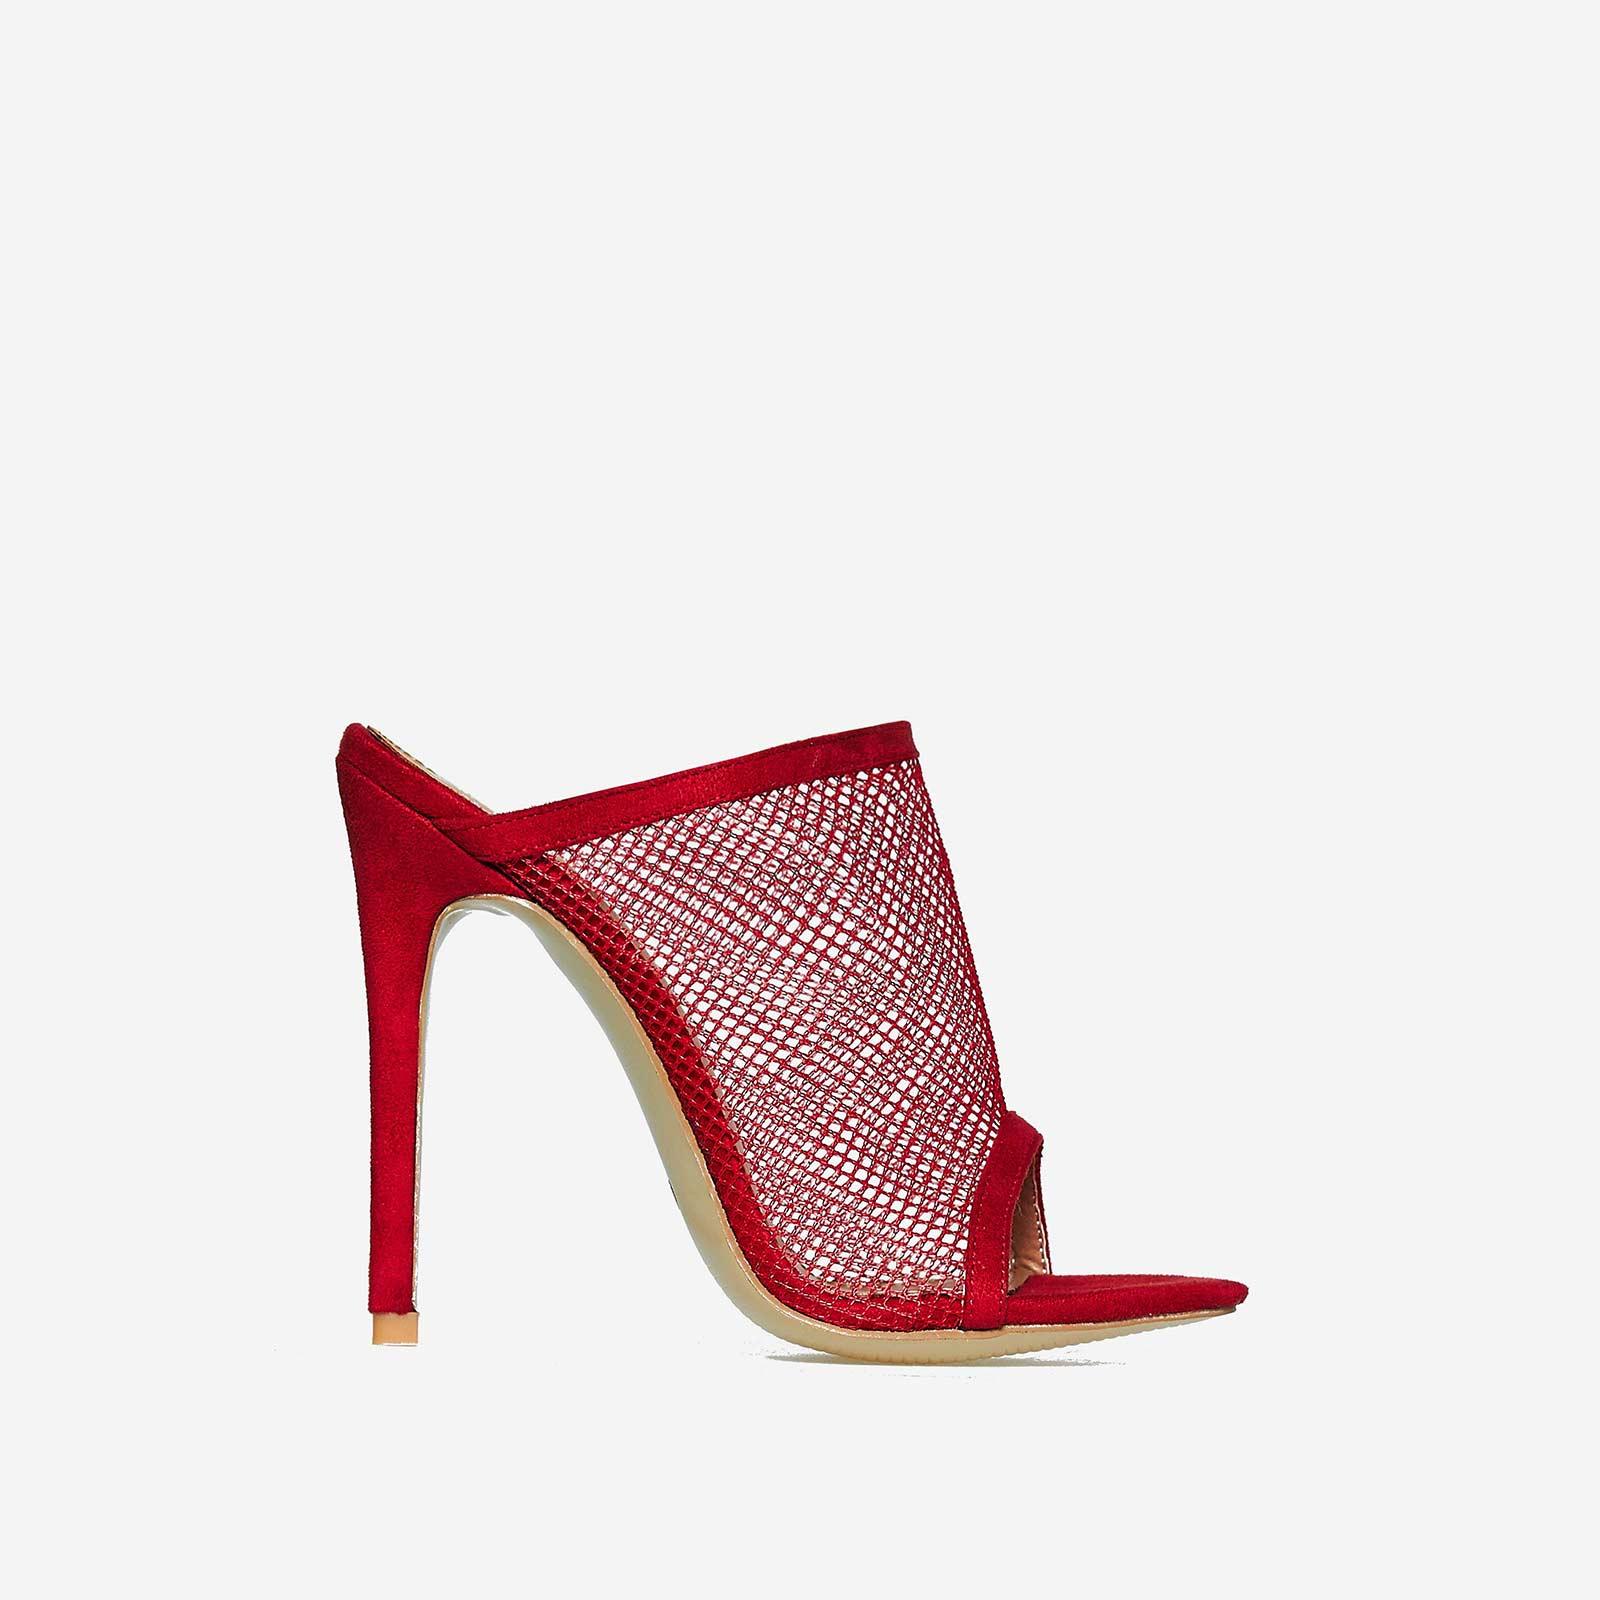 Cardi Fishnet Peep Toe Mule In Red Faux Suede